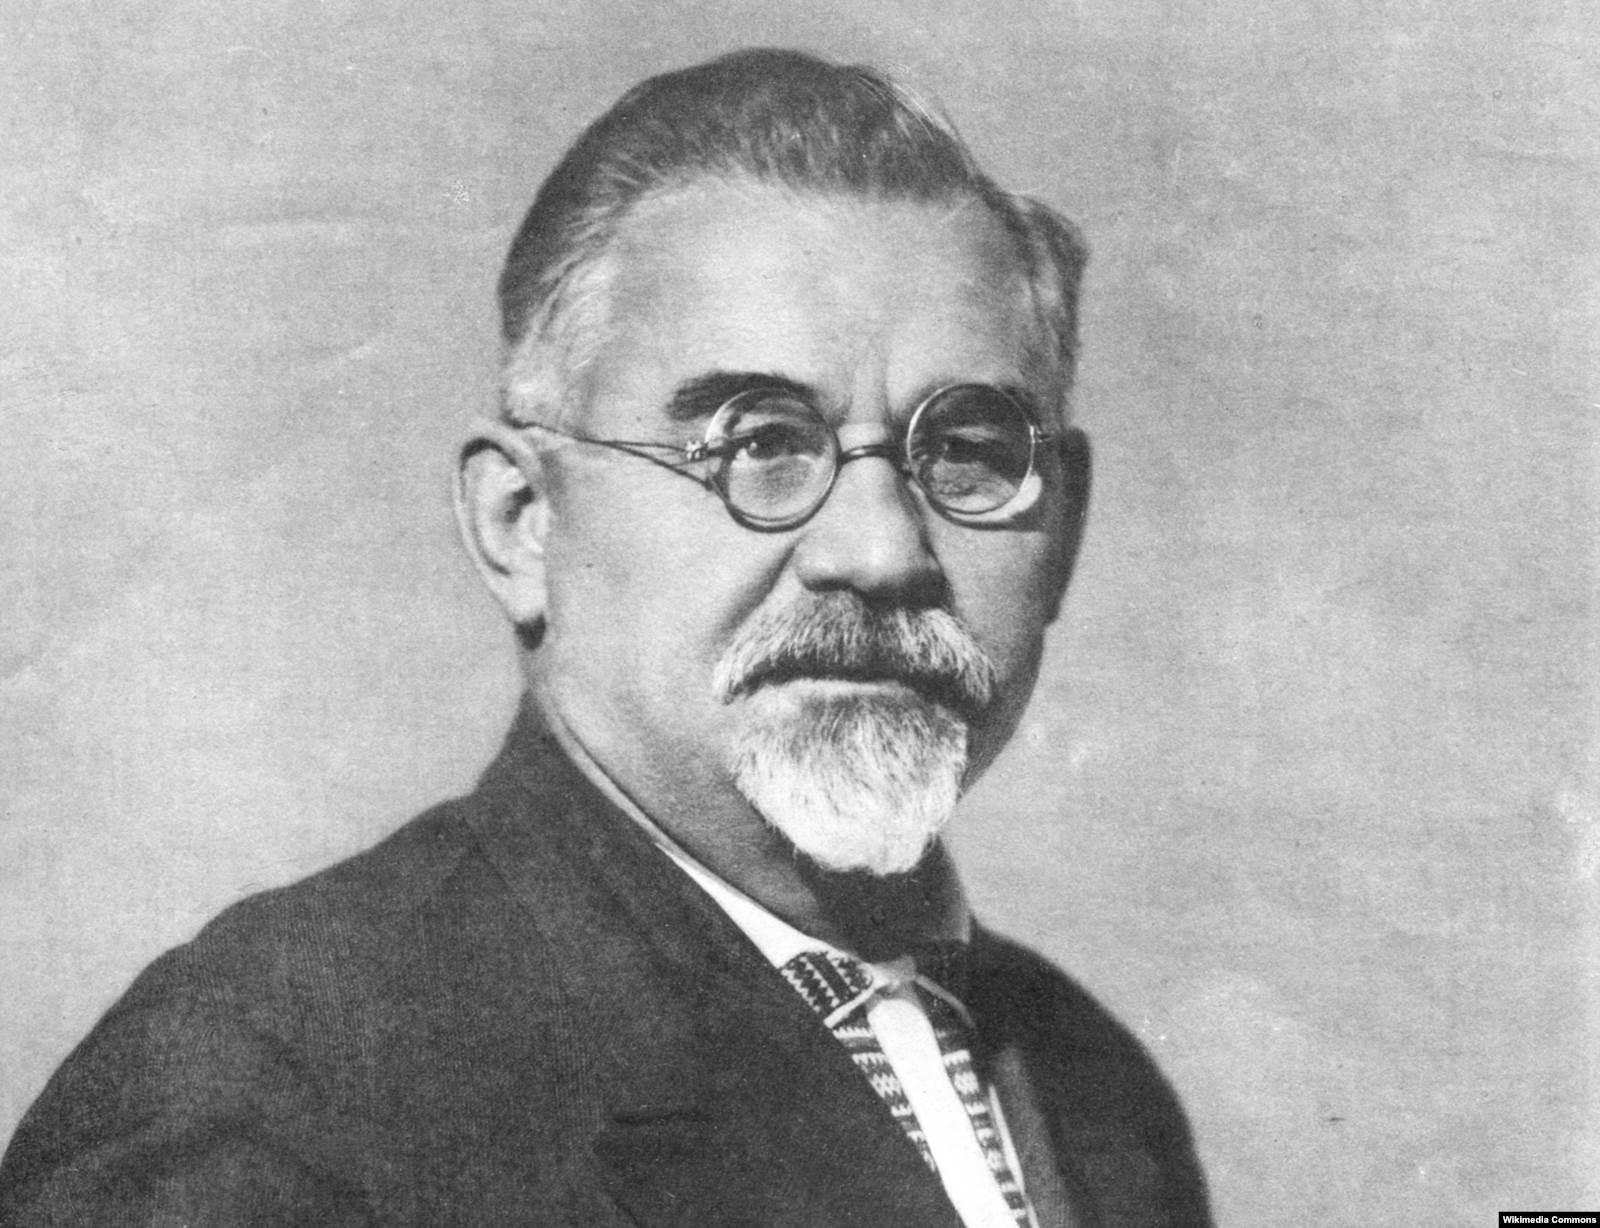 Григорий Петровский, 1937